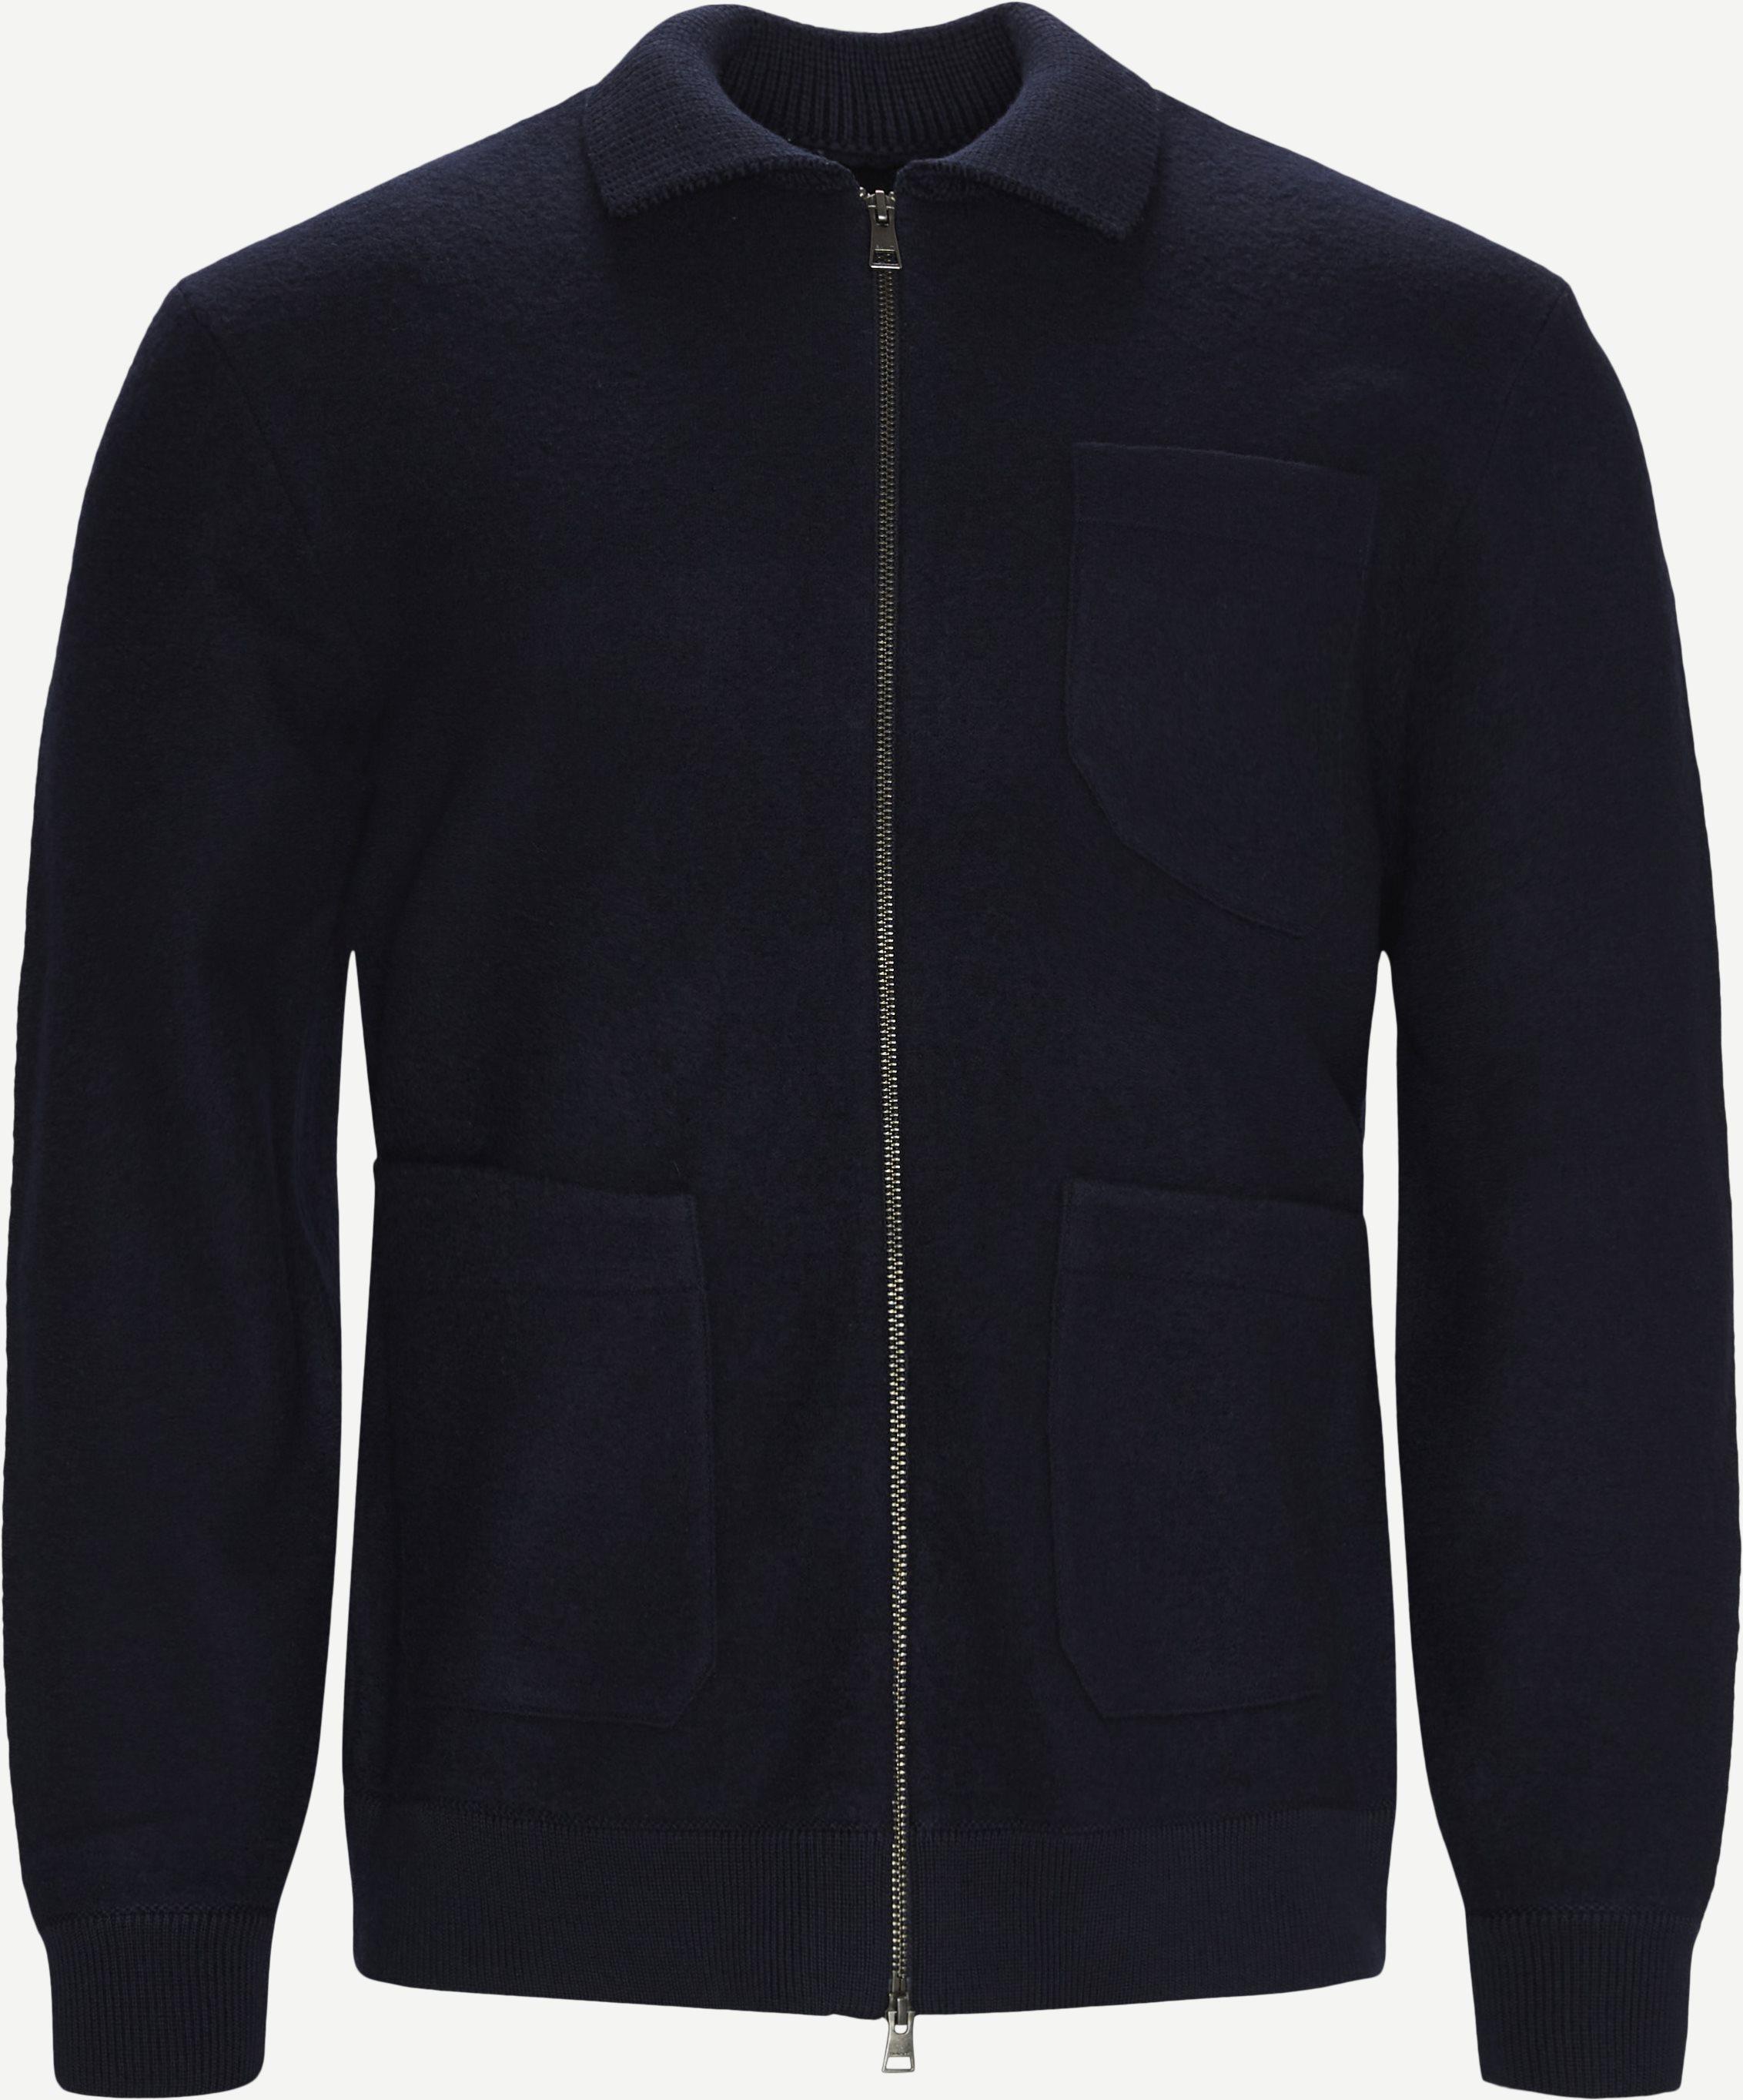 Boiled Knitted Jacket - Jackor - Regular - Blå